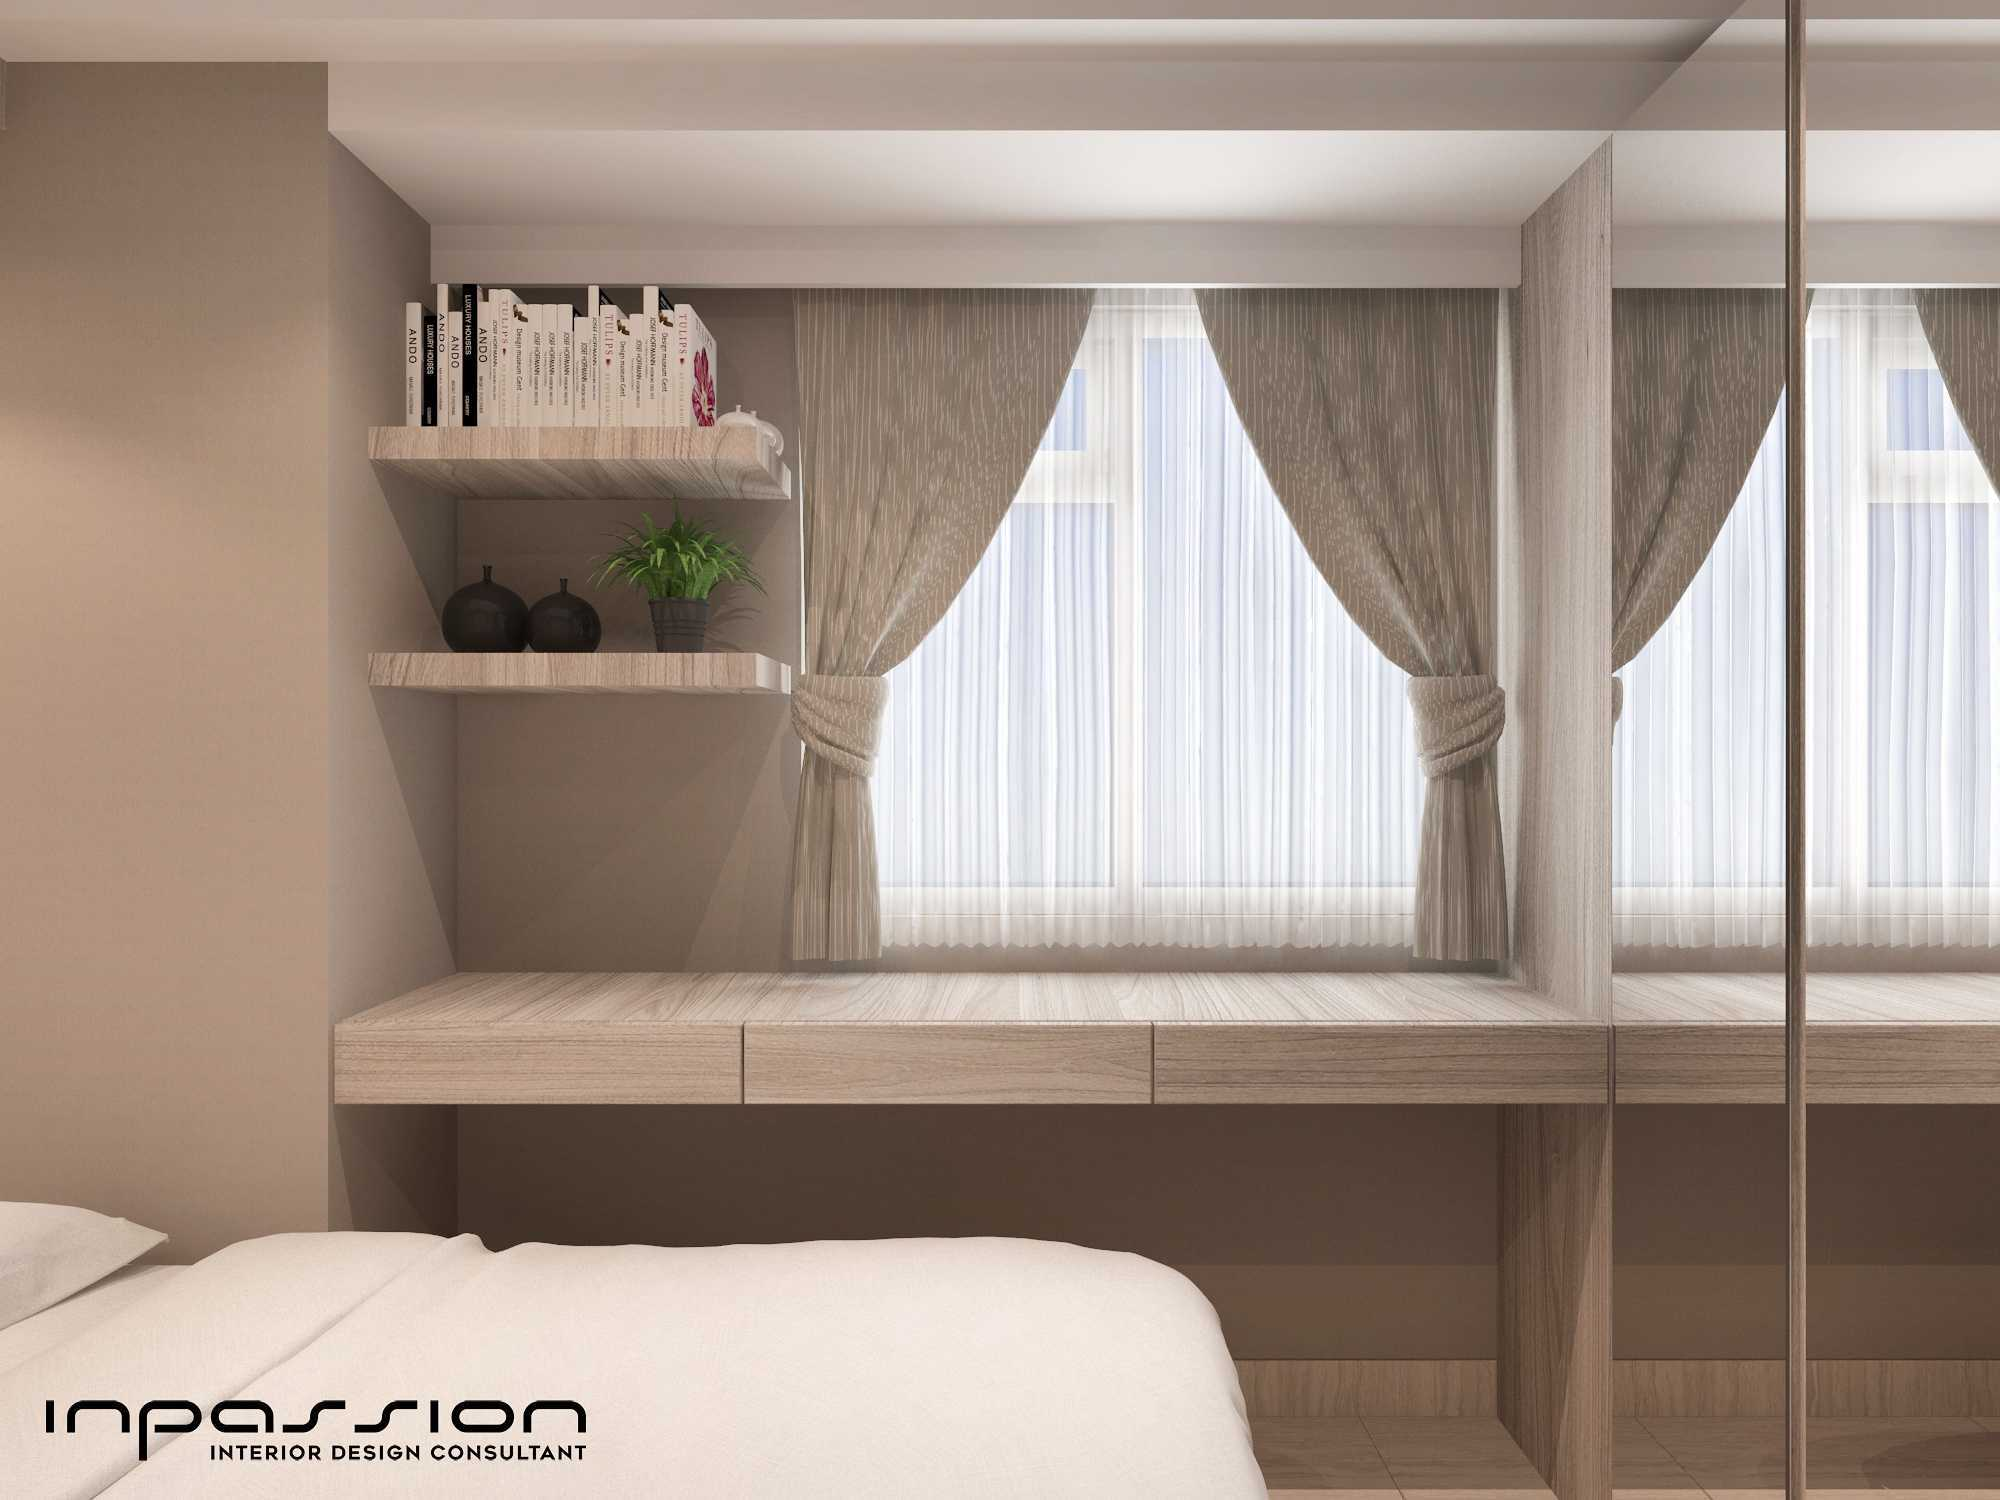 Inpassion Interior Design Educity Apartemen 3 Bedroom Surabaya City, East Java, Indonesia Surabaya City, East Java, Indonesia Img20170510163958177 Kontemporer  31591